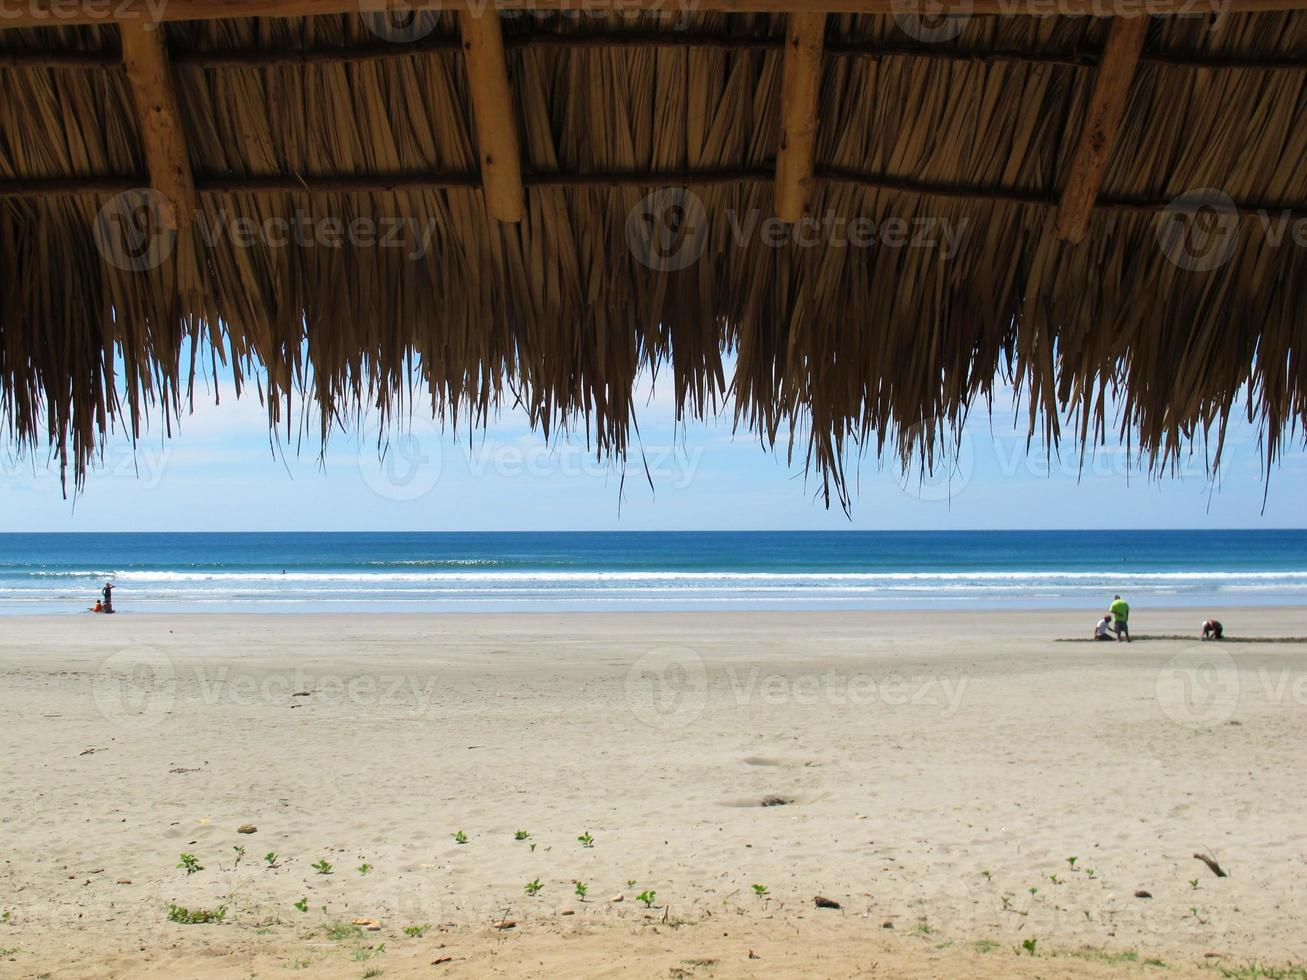 lugn strand med palmblad Cabana. foto